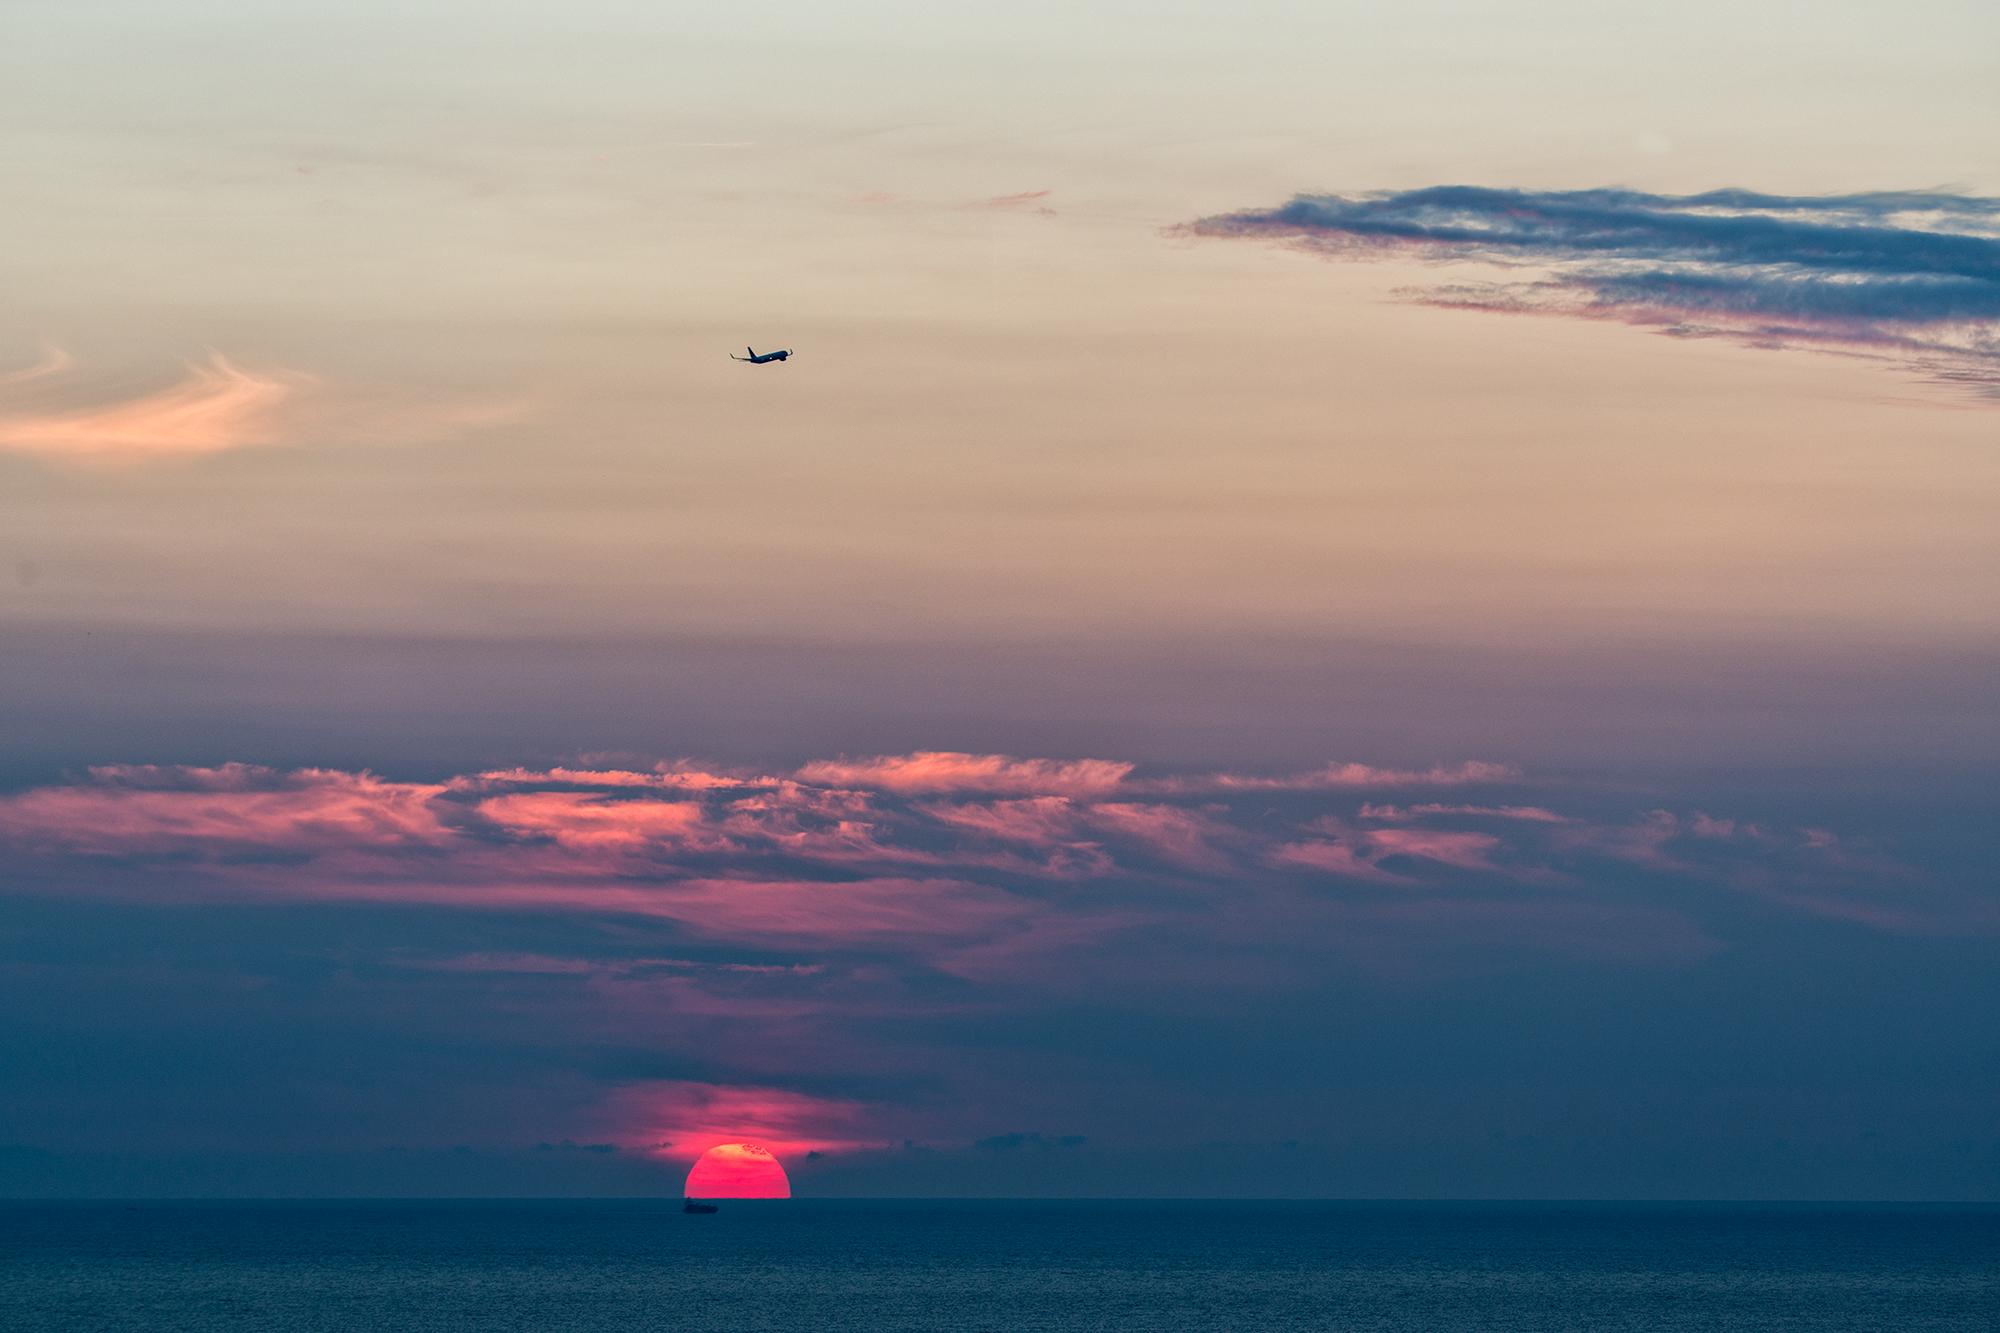 Sunrise Arrival. Barcelona, 2015